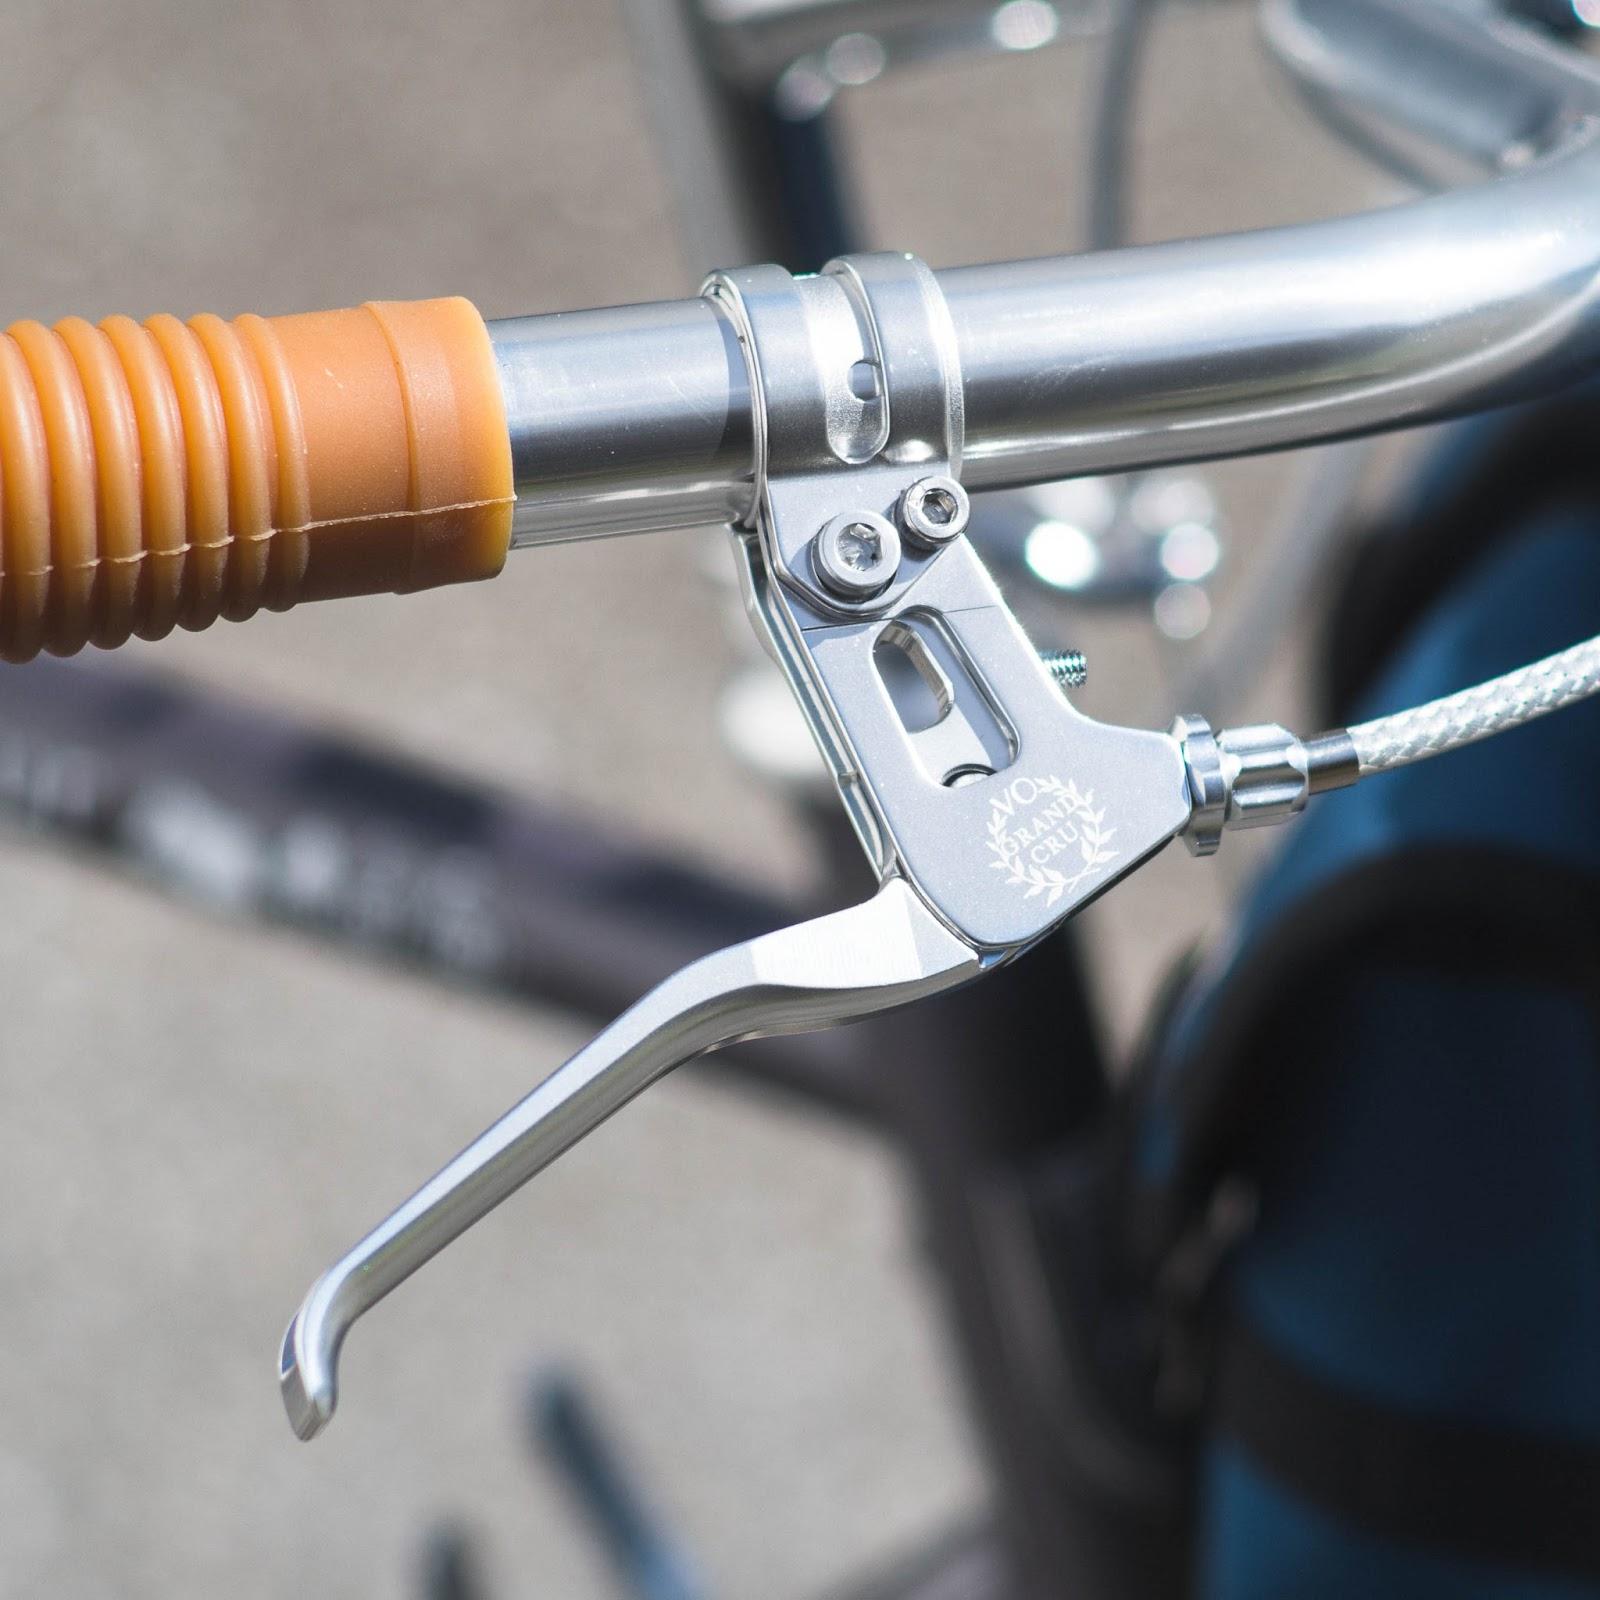 Vintage Dia Compe road bike BRAKE LEVER non aero    NOS